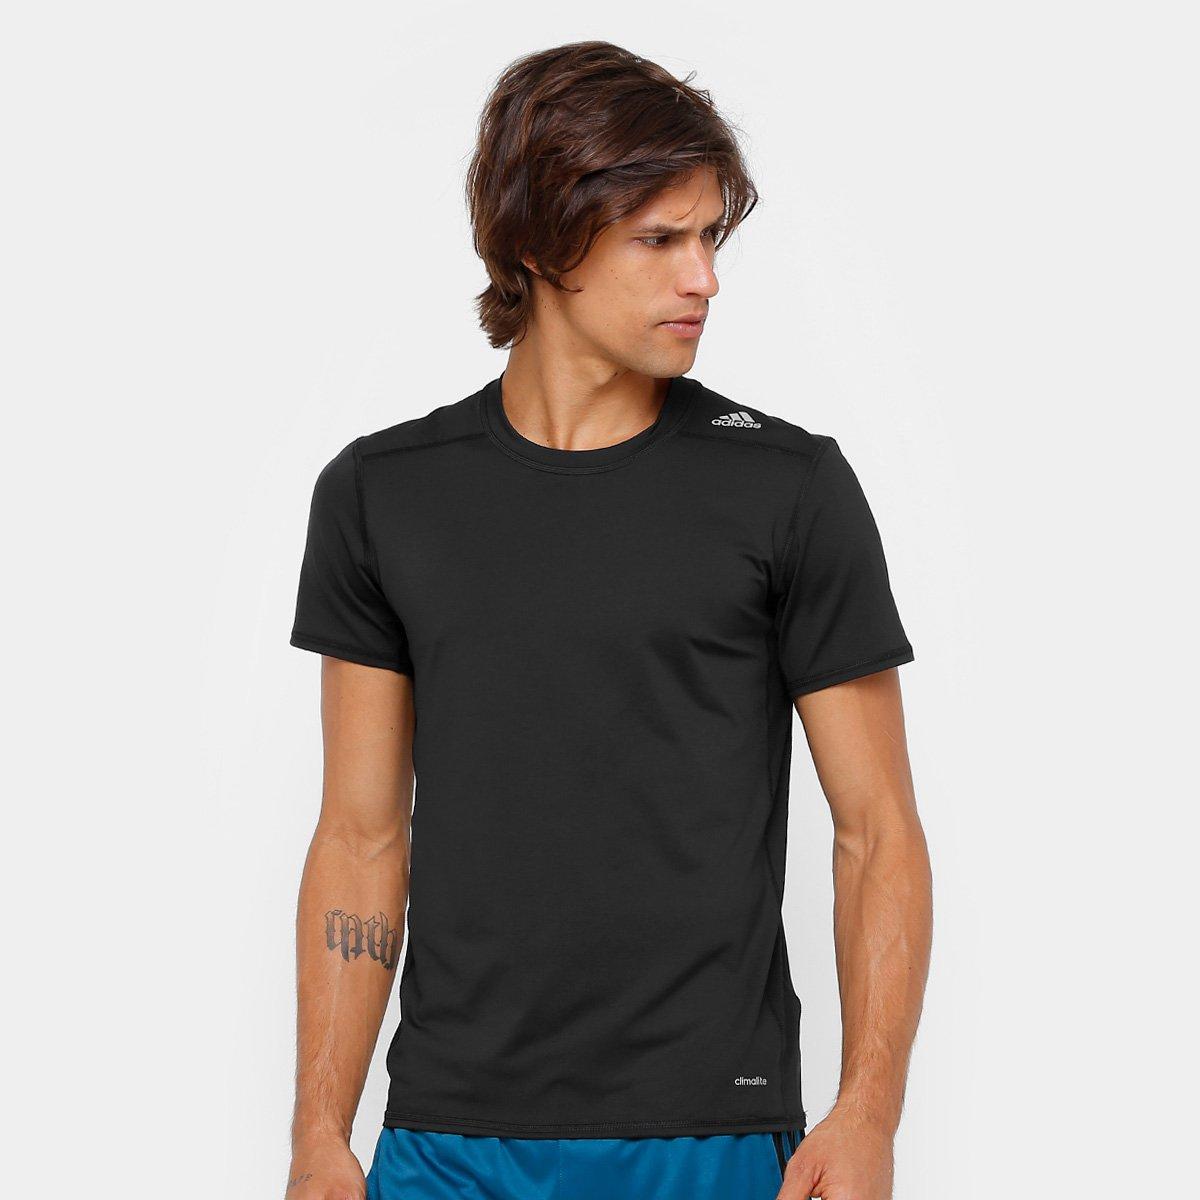 c230ee7232499 Camiseta Adidas Tf Base Fitted M Masculino - Preto - Compre Agora ...